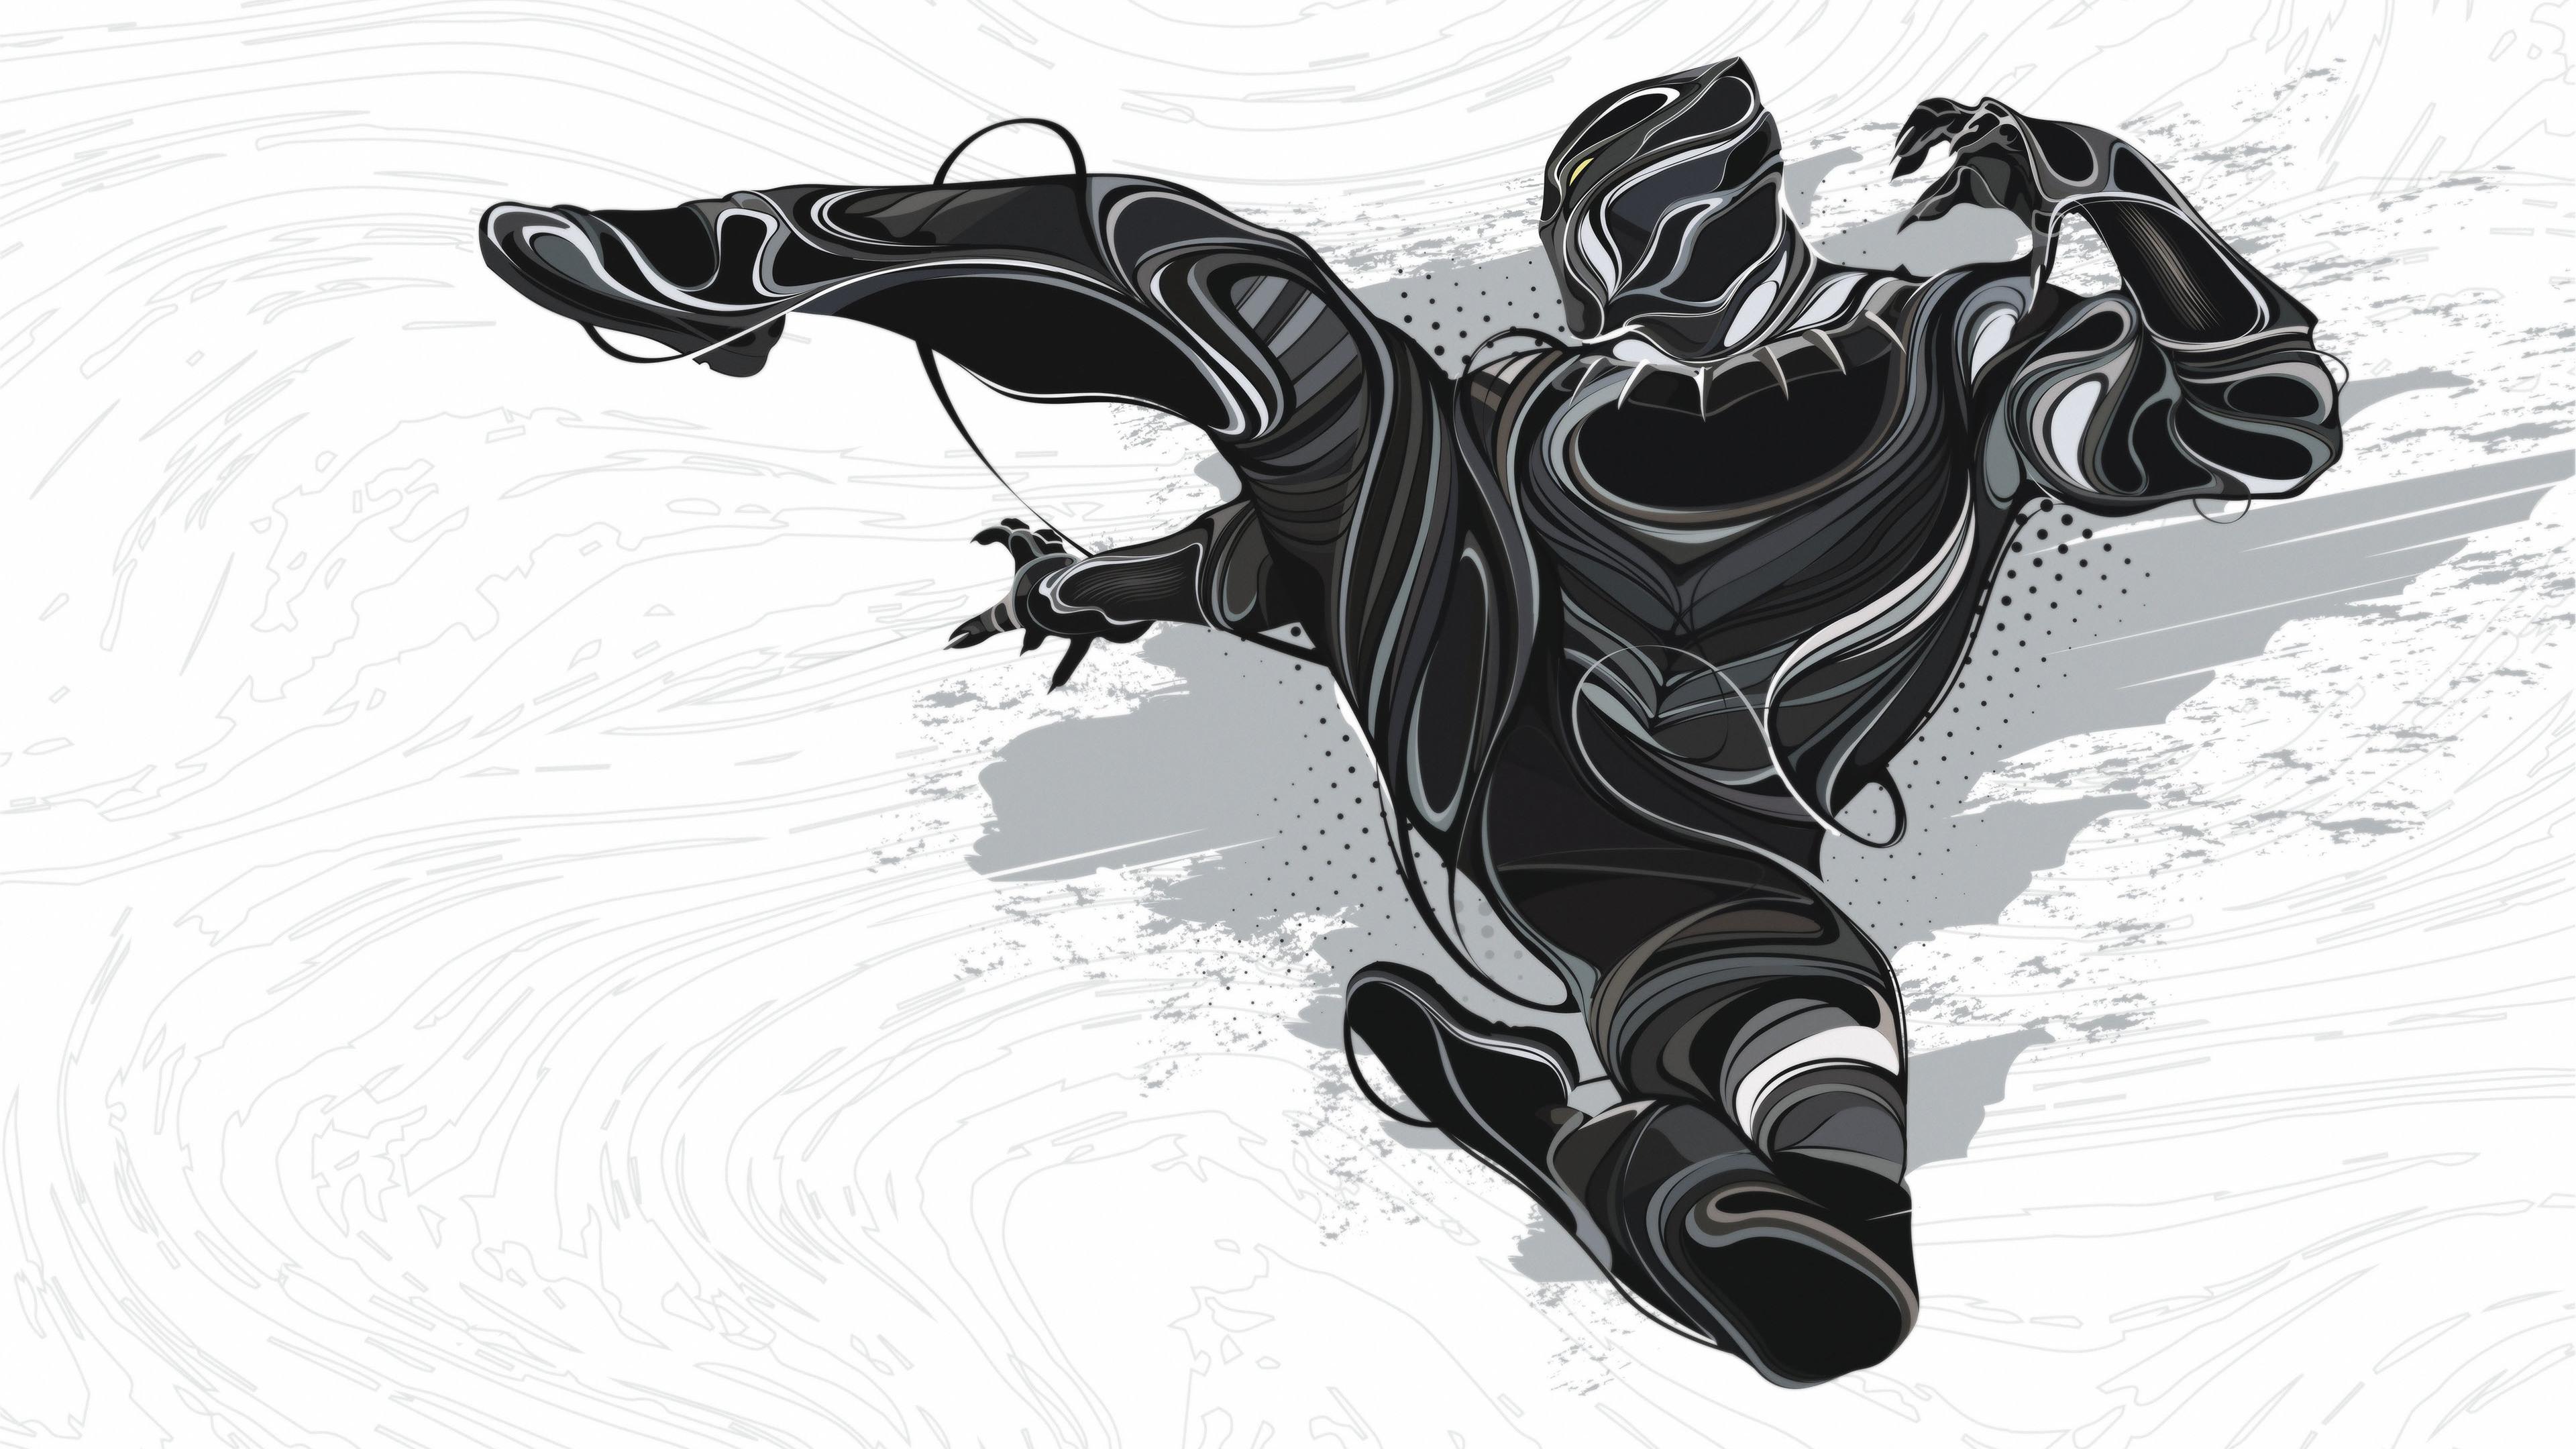 4k black panther art 1537645983 - 4k Black Panther Art - superheroes wallpapers, digital art wallpapers, black panther wallpapers, behance wallpapers, artwork wallpapers, art wallpapers, 4k-wallpapers